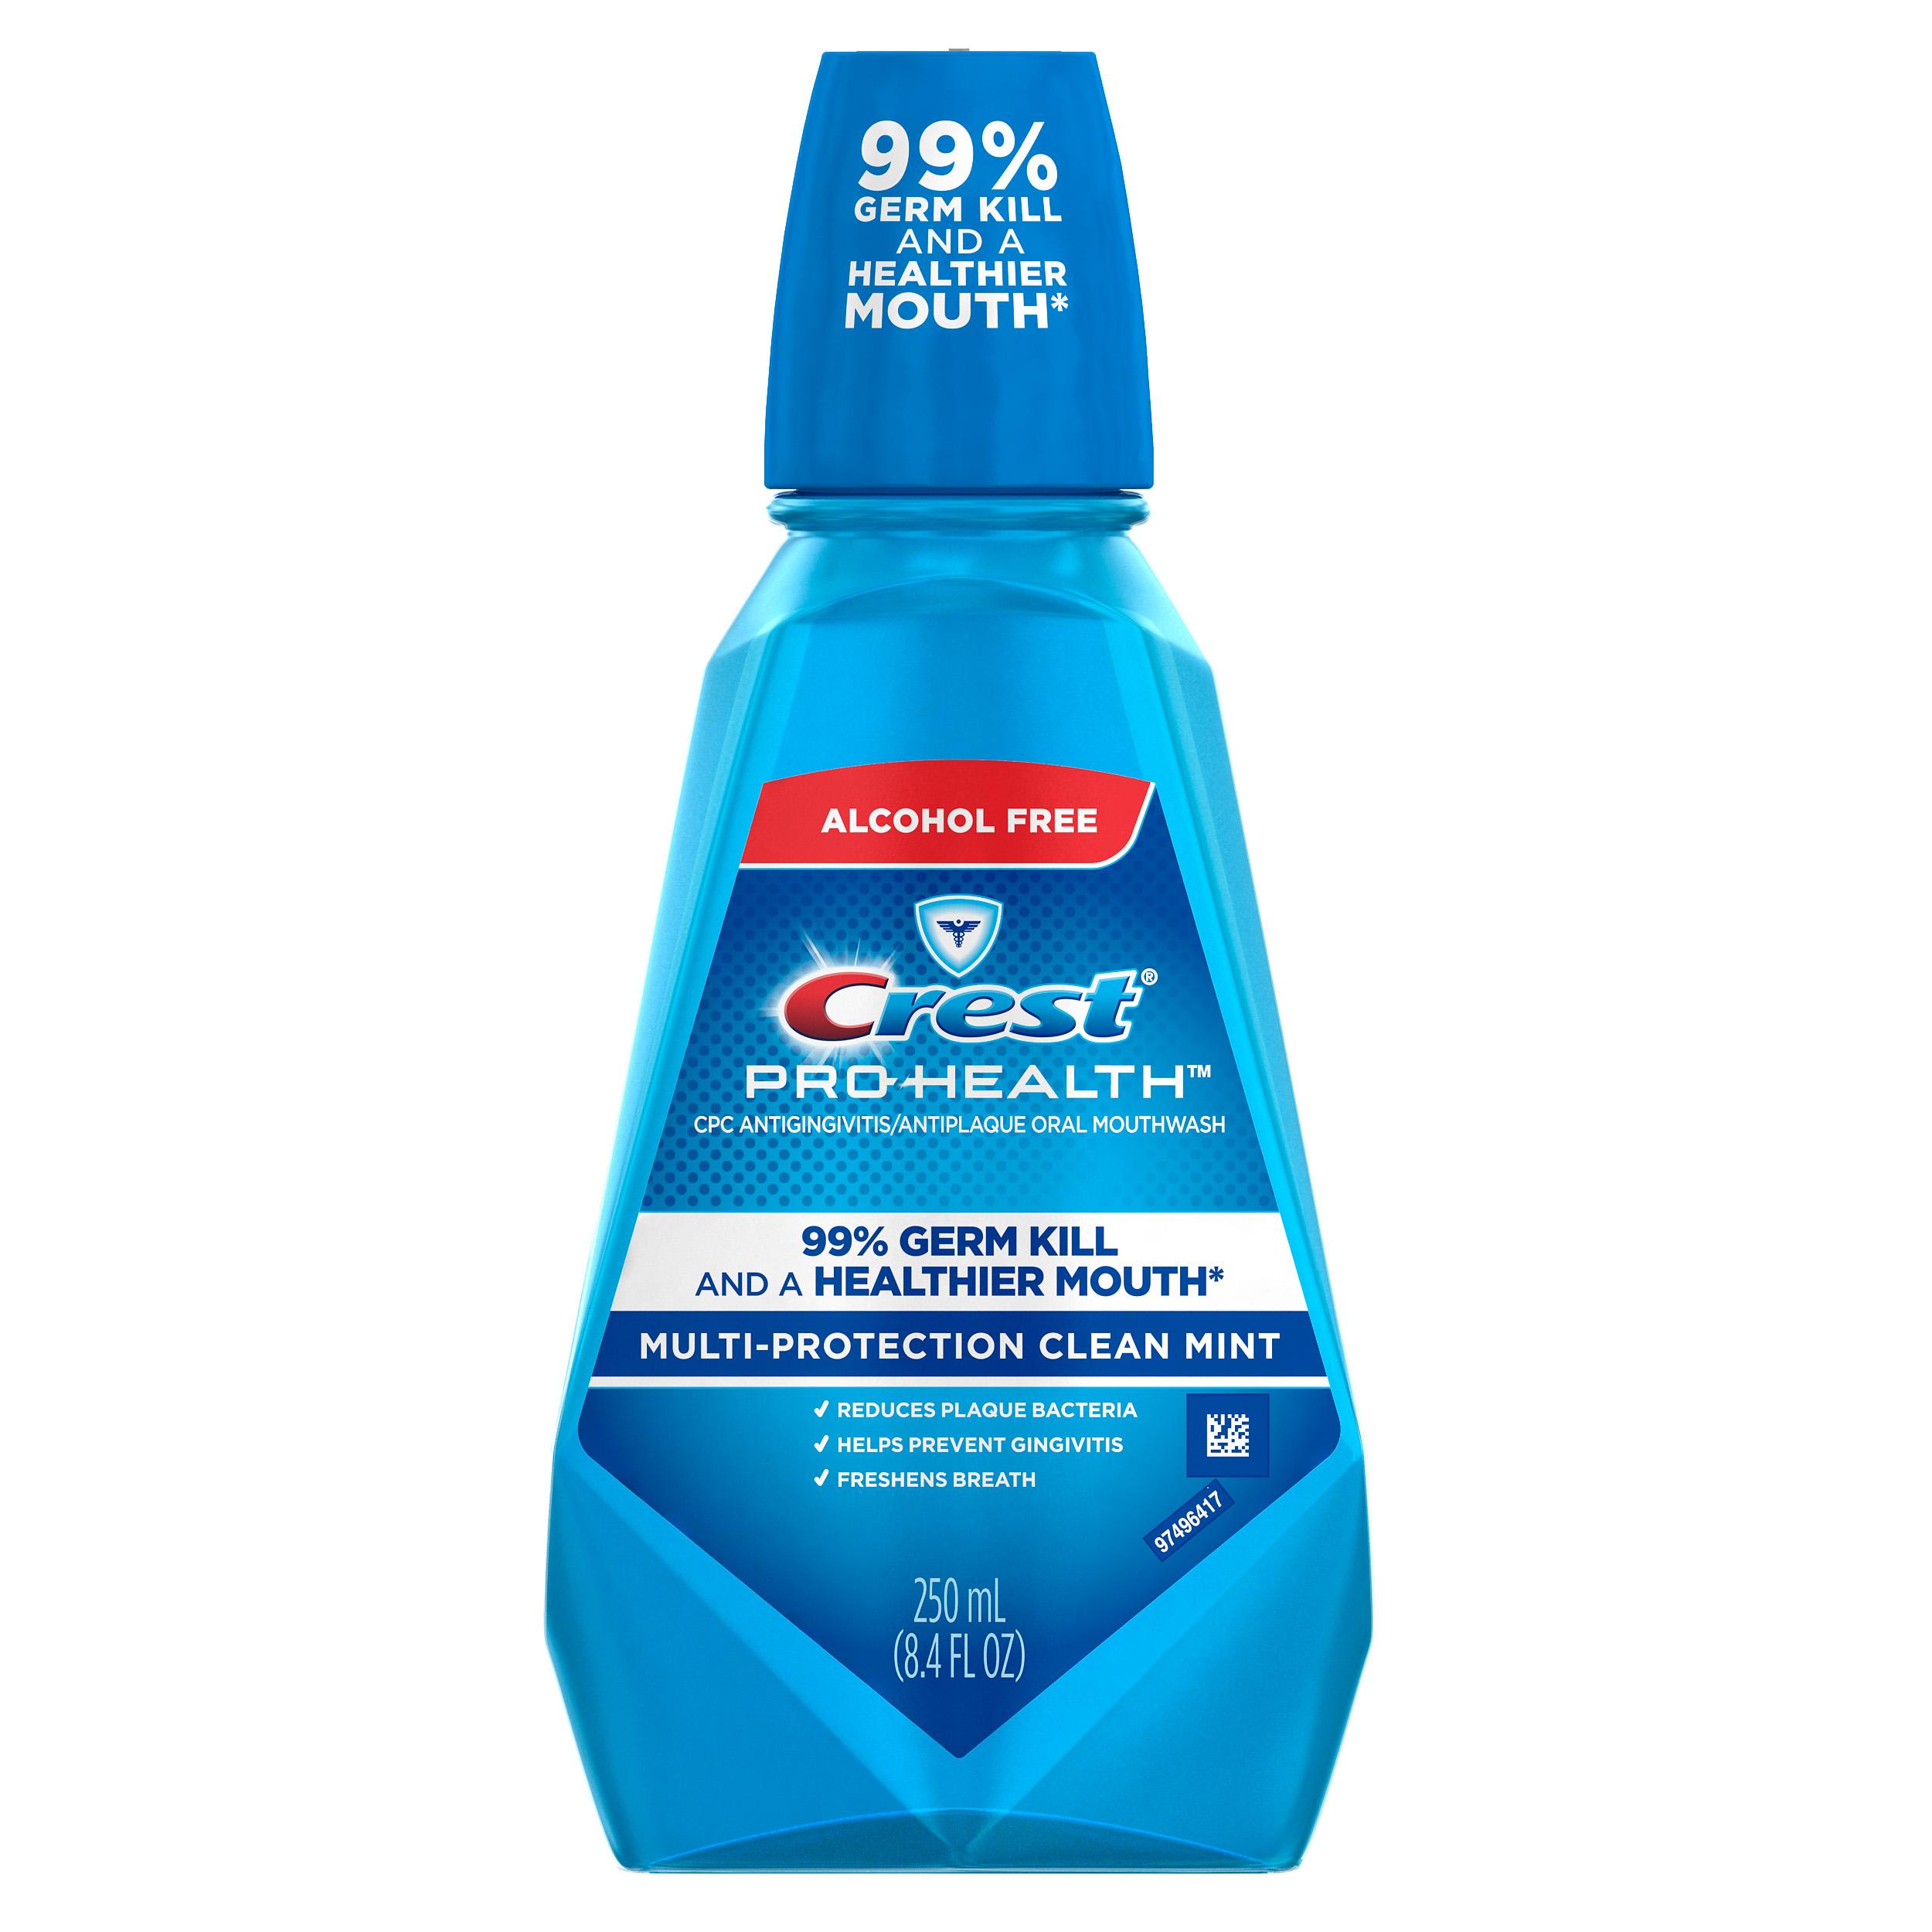 Crest Pro-Health Multi-Protection Alcohol Free Mouthwash, Clean Mint, 8.4 fl oz (250 mL)